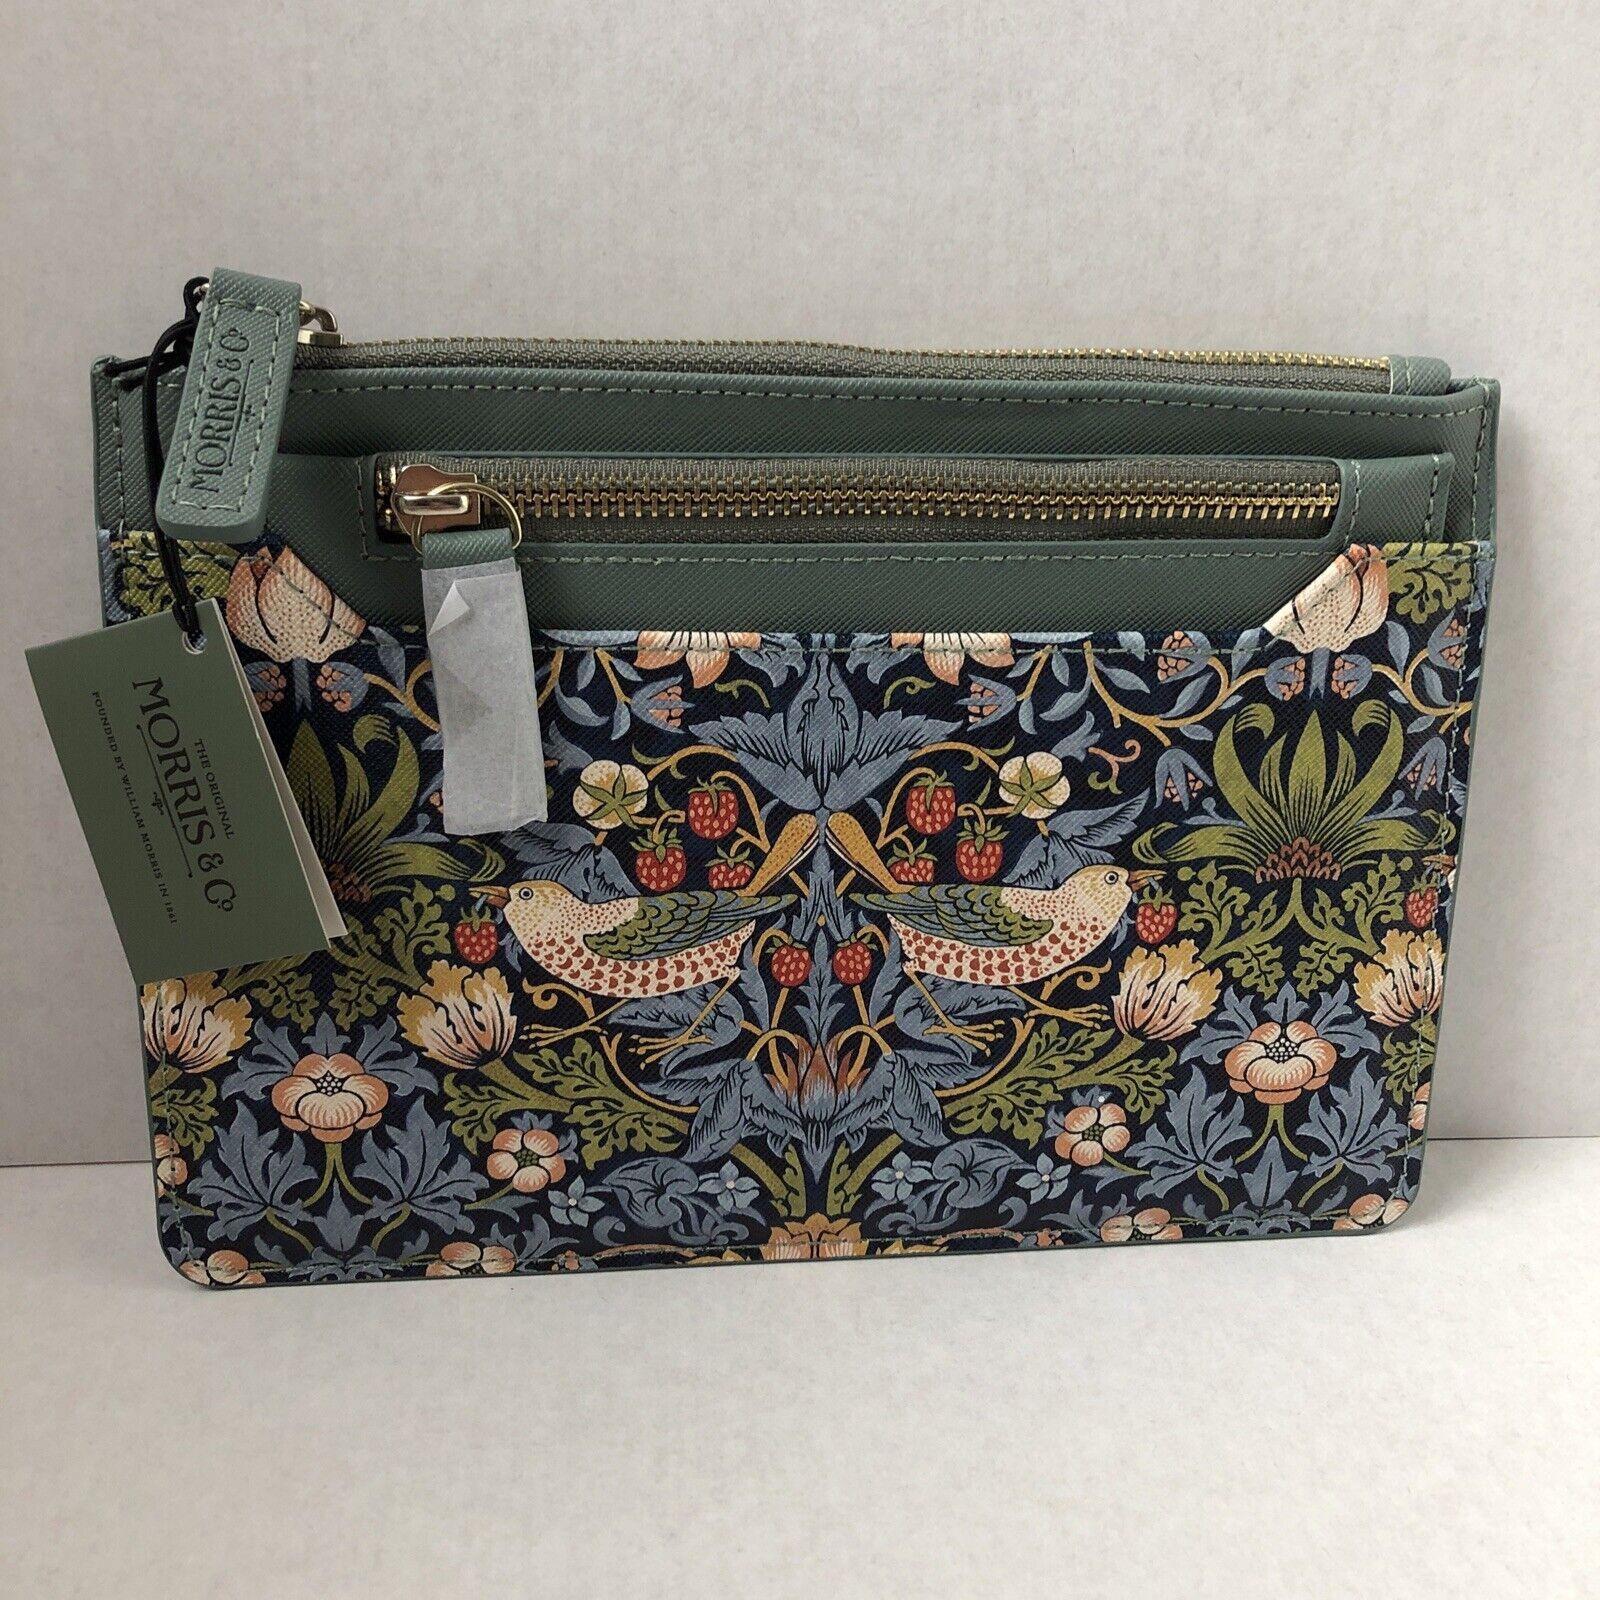 Morris & Co. Bag Travel & Organiser Purse Wallet -New - Strawberry Thief